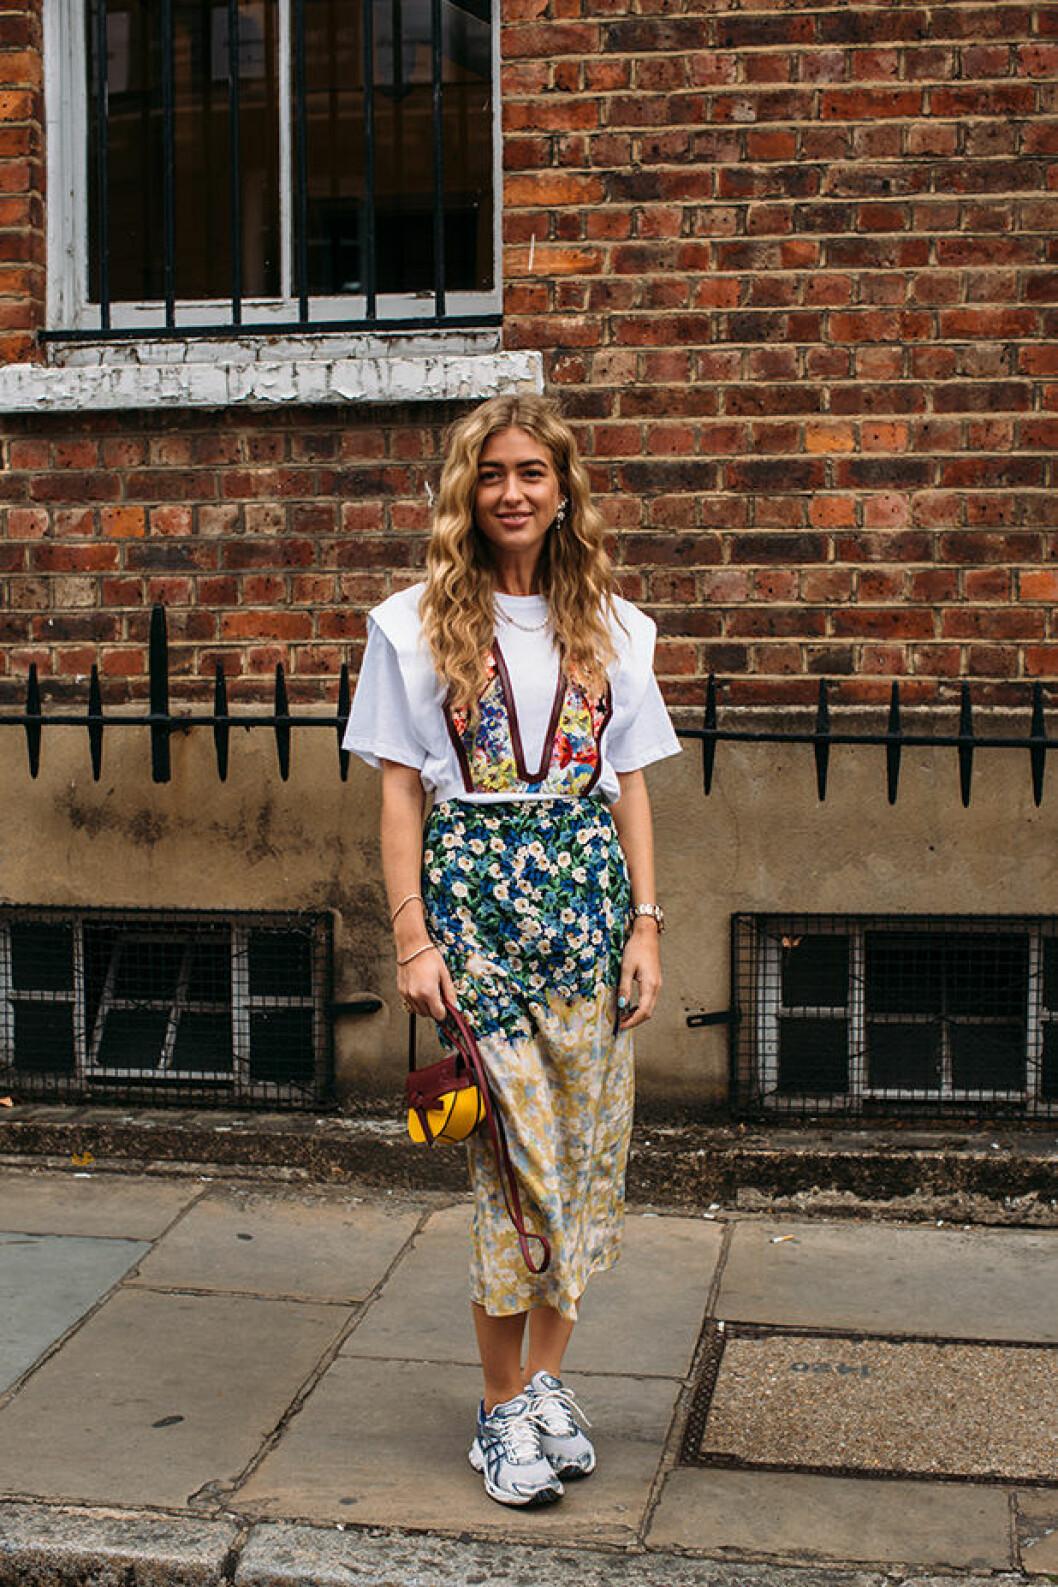 Streetstyleinspiration från modeveckan i London.